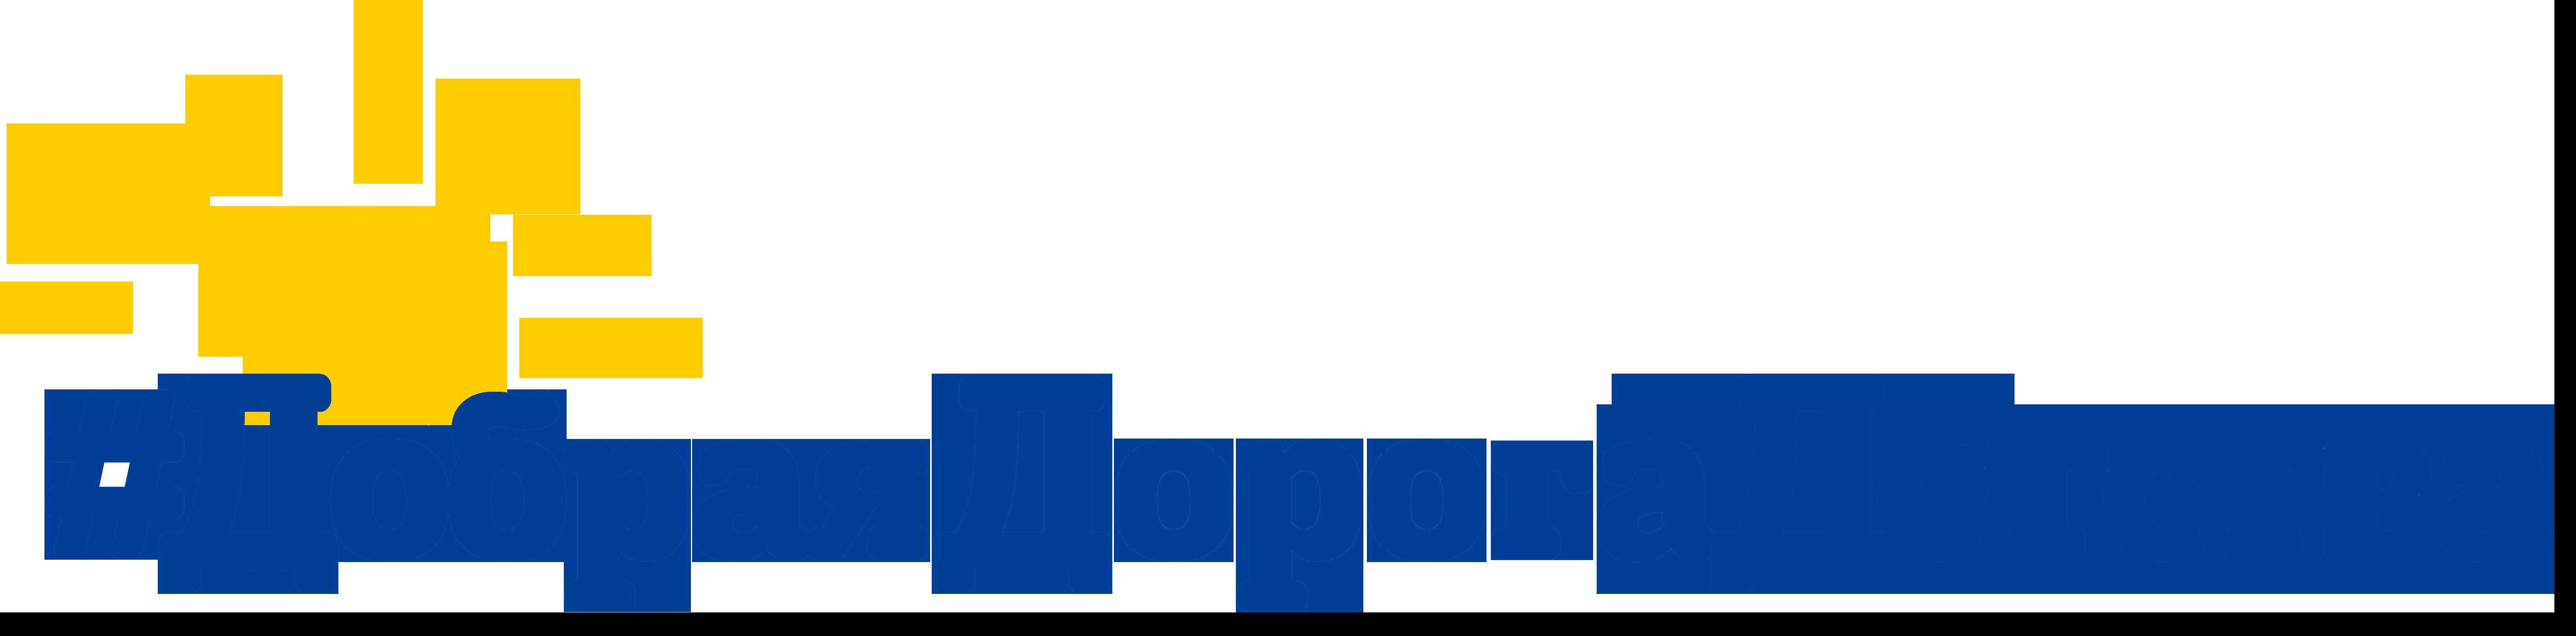 http://www.dddgazeta.ru/bitrix/templates/ddd_main/images/logo-new.png